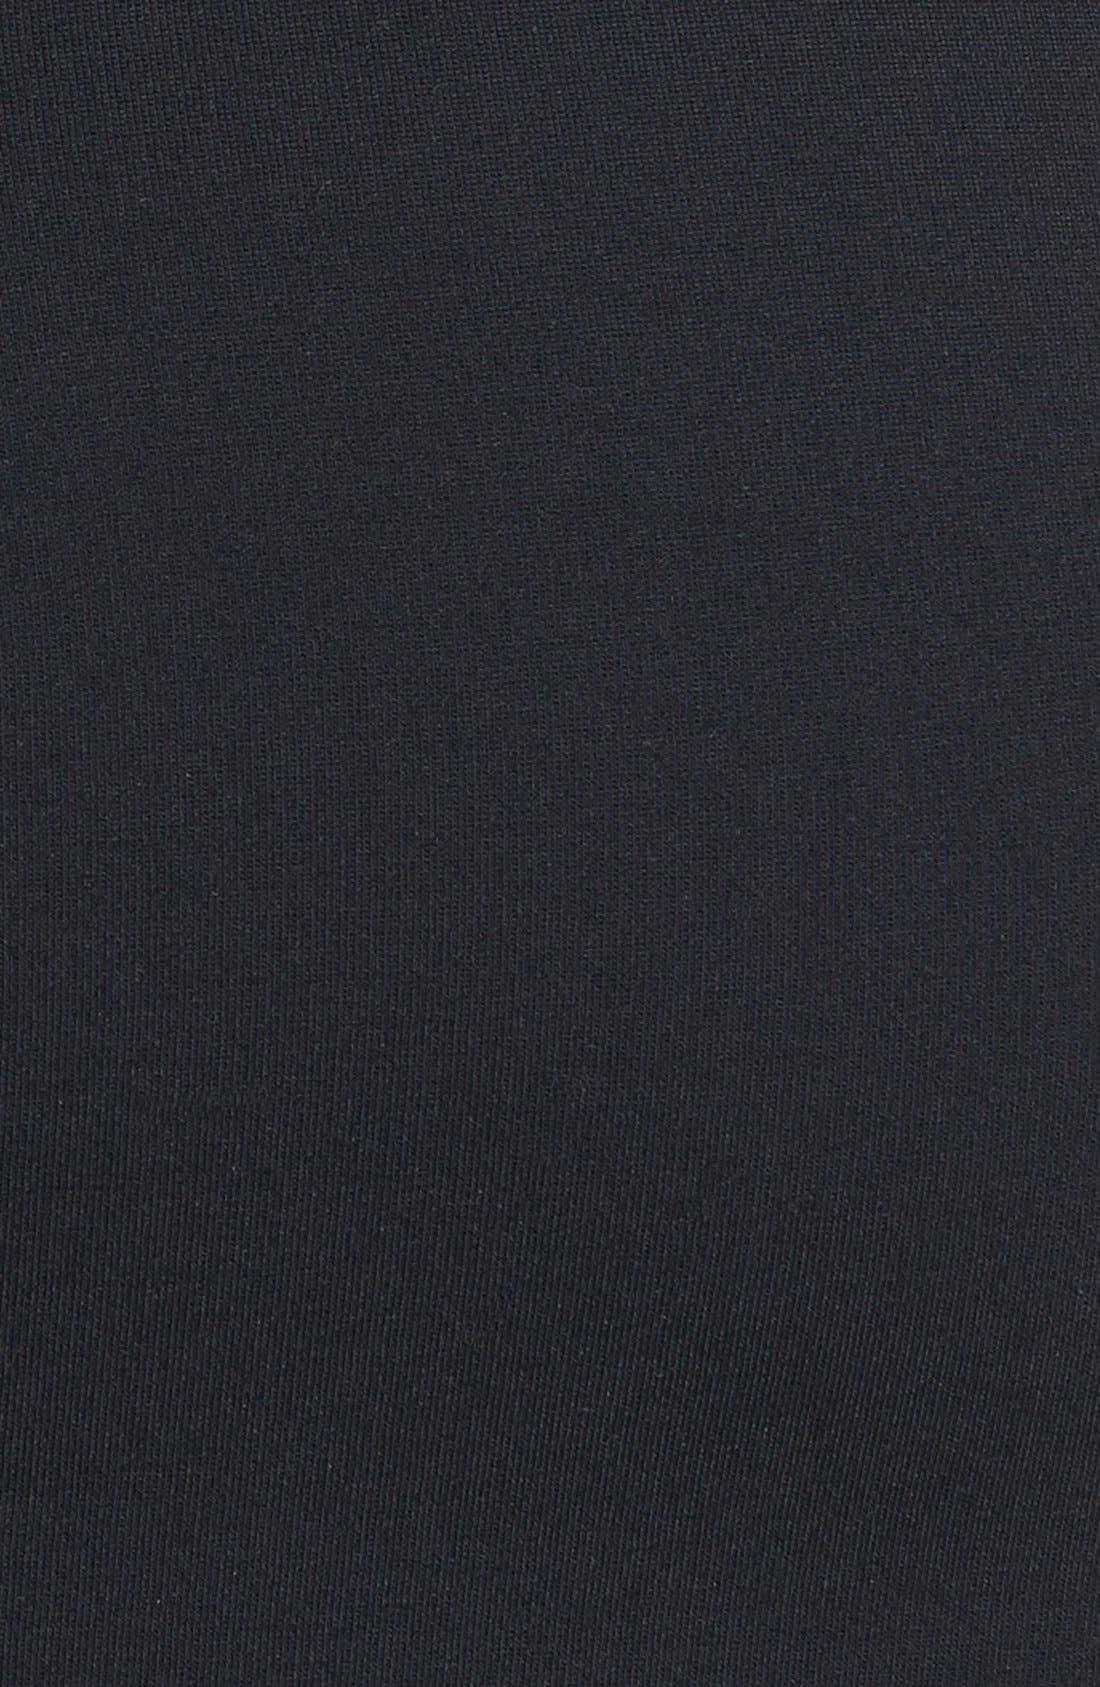 Alternate Image 3  - Trouvé Seam Detail Pencil Skirt